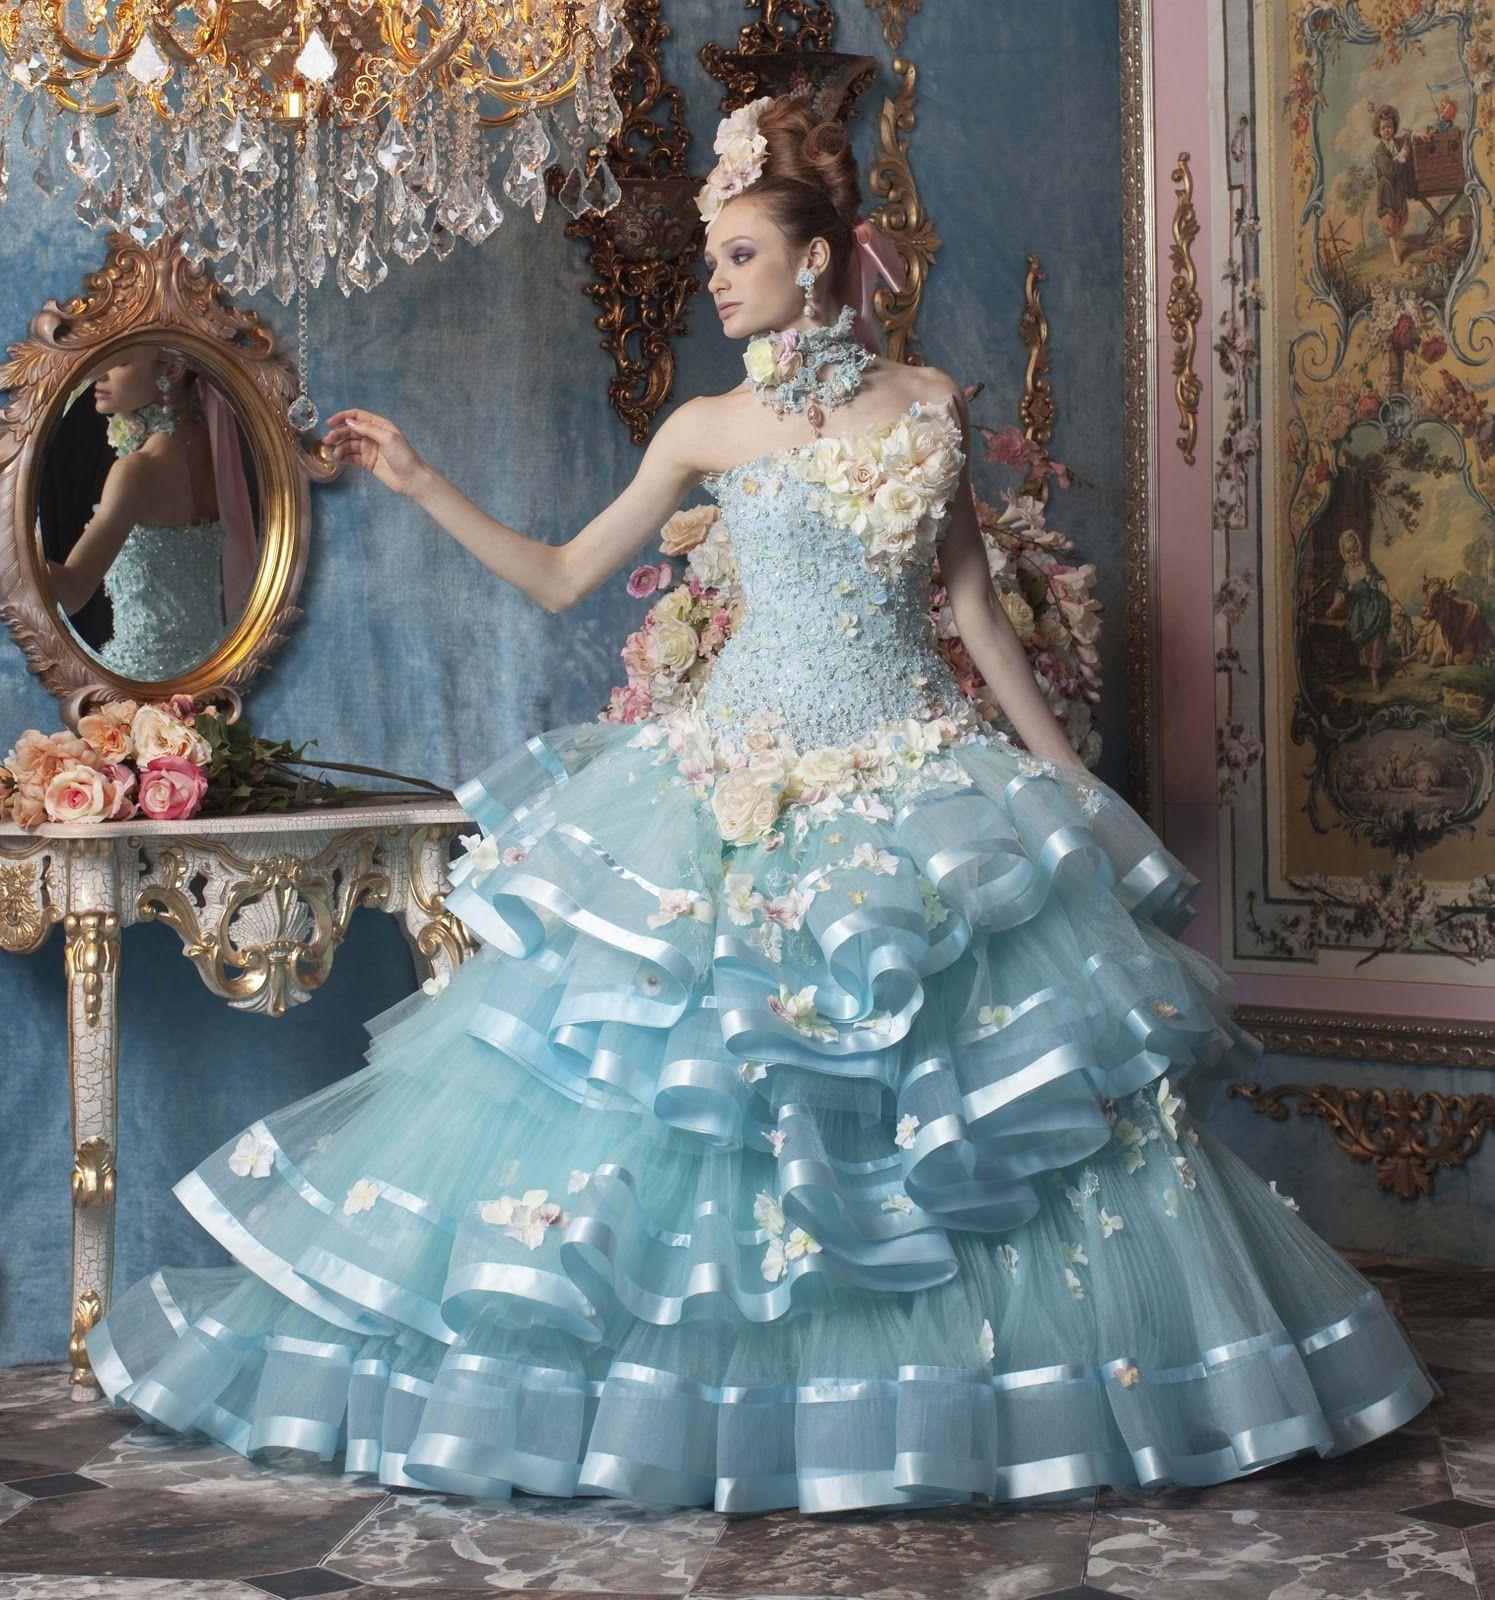 Mis Vestidos de Novia | VESTIDOS | Pinterest | Vestidos de novia, De ...